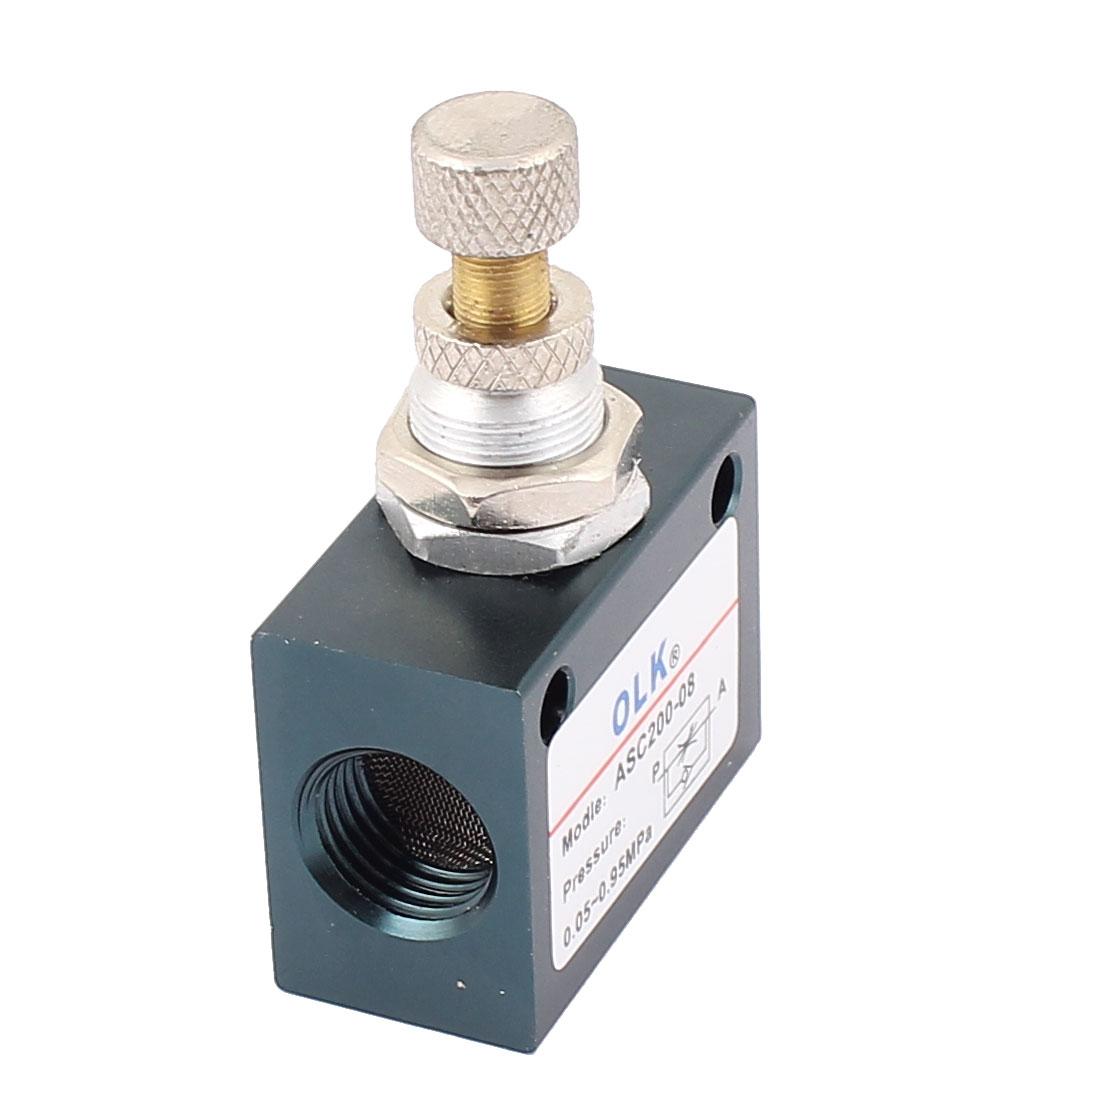 1/4PT Thread Dia Single Way Pneumatic Hydraulic Flow Control Valve